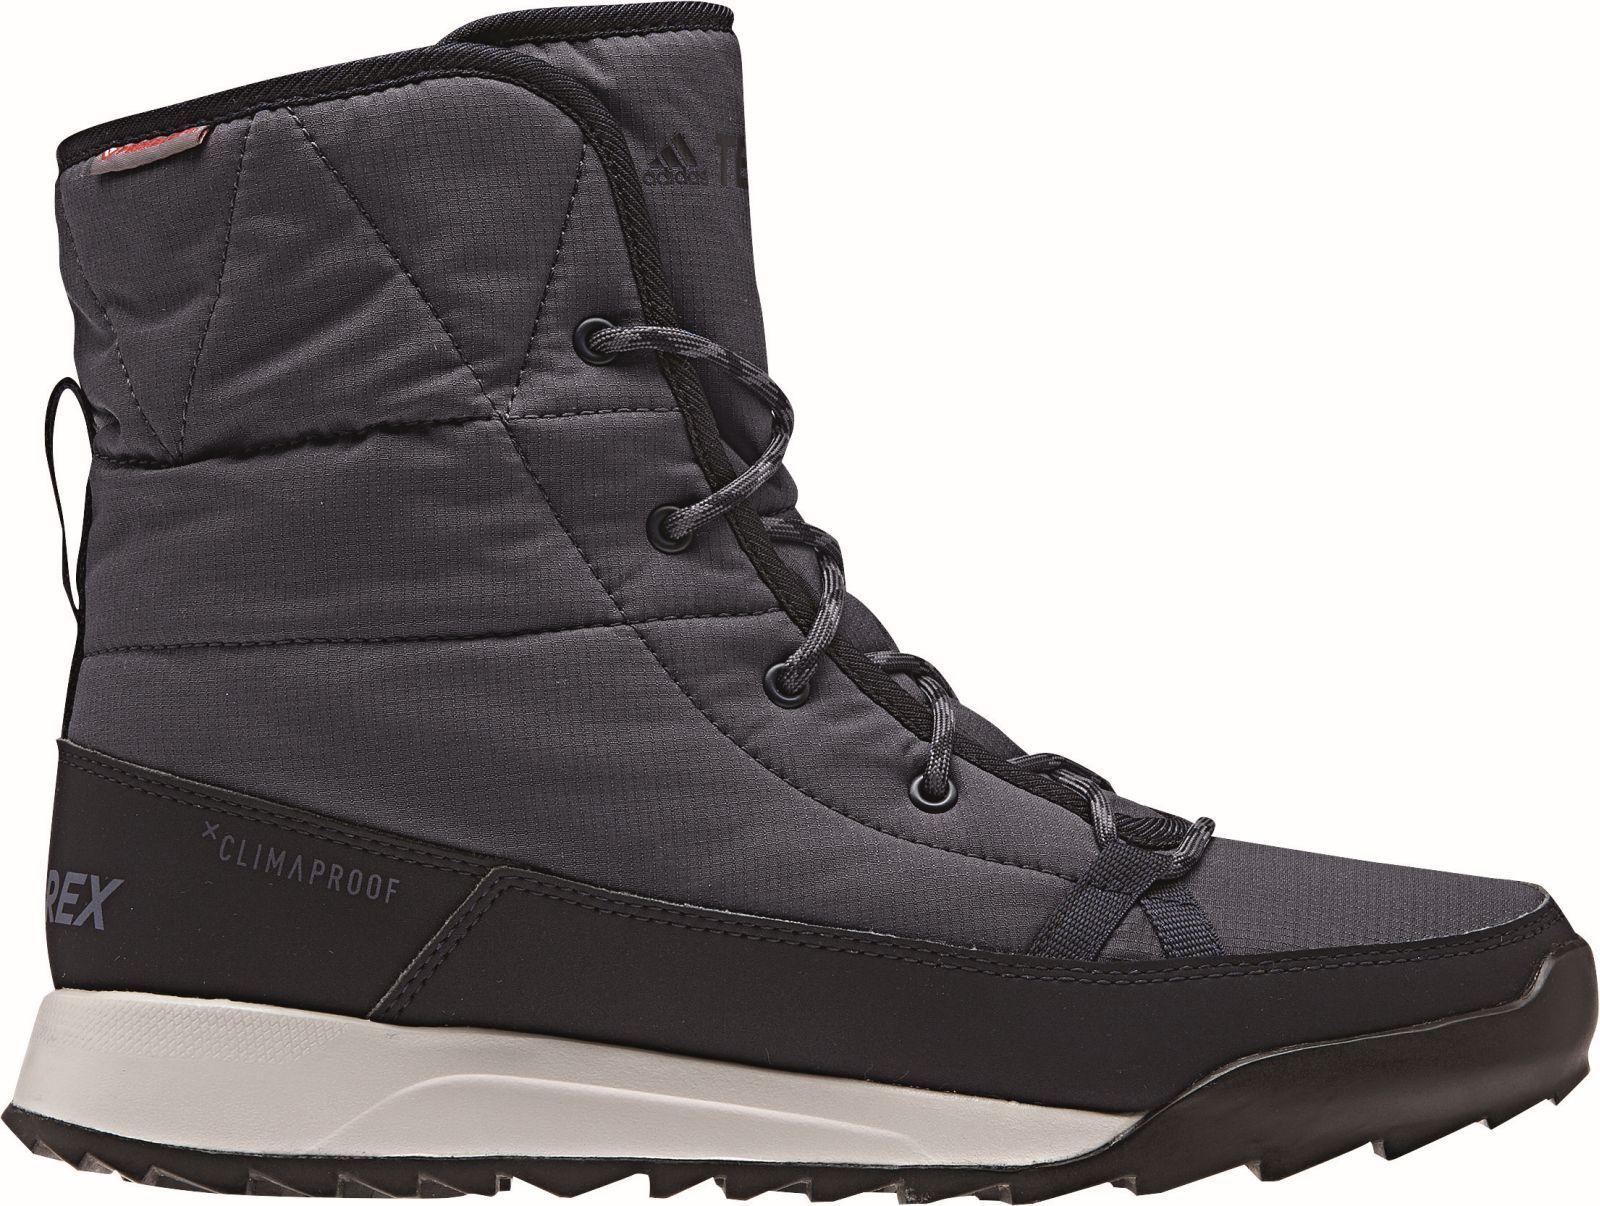 Adidas performance señora senderismo outdoor zapato Terrex choleah Padded CP azul